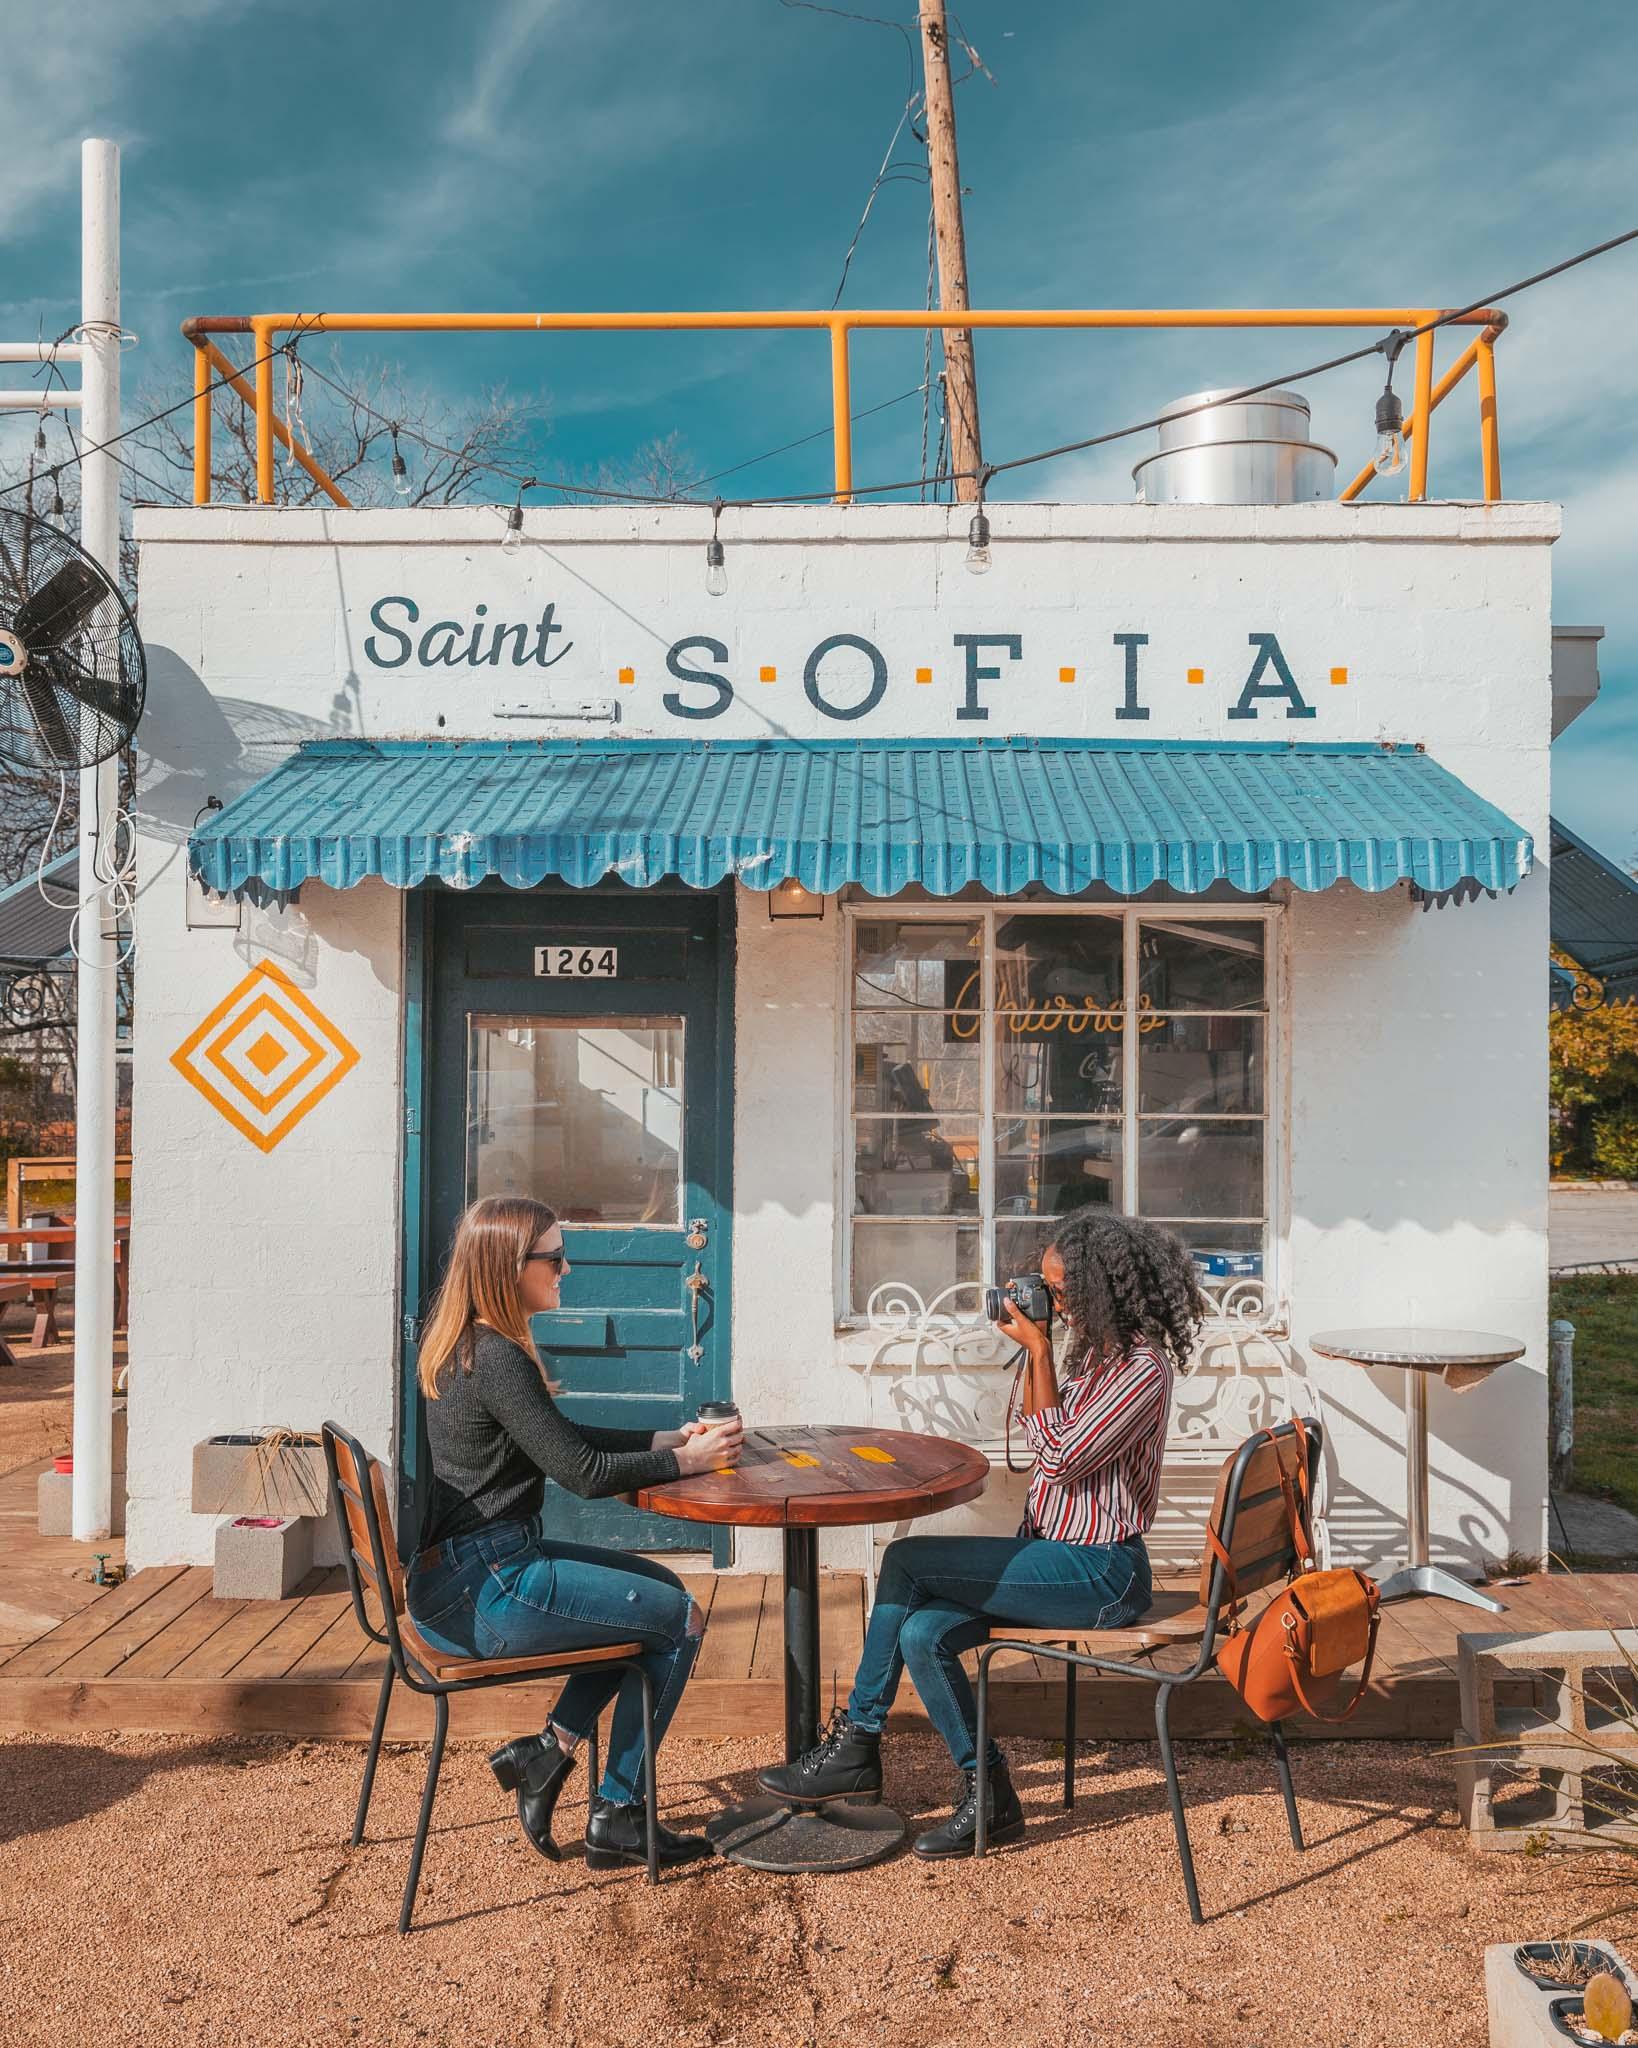 Saint Sofia cute storefront on Magnolia Avenue in Fort Worth, Texas